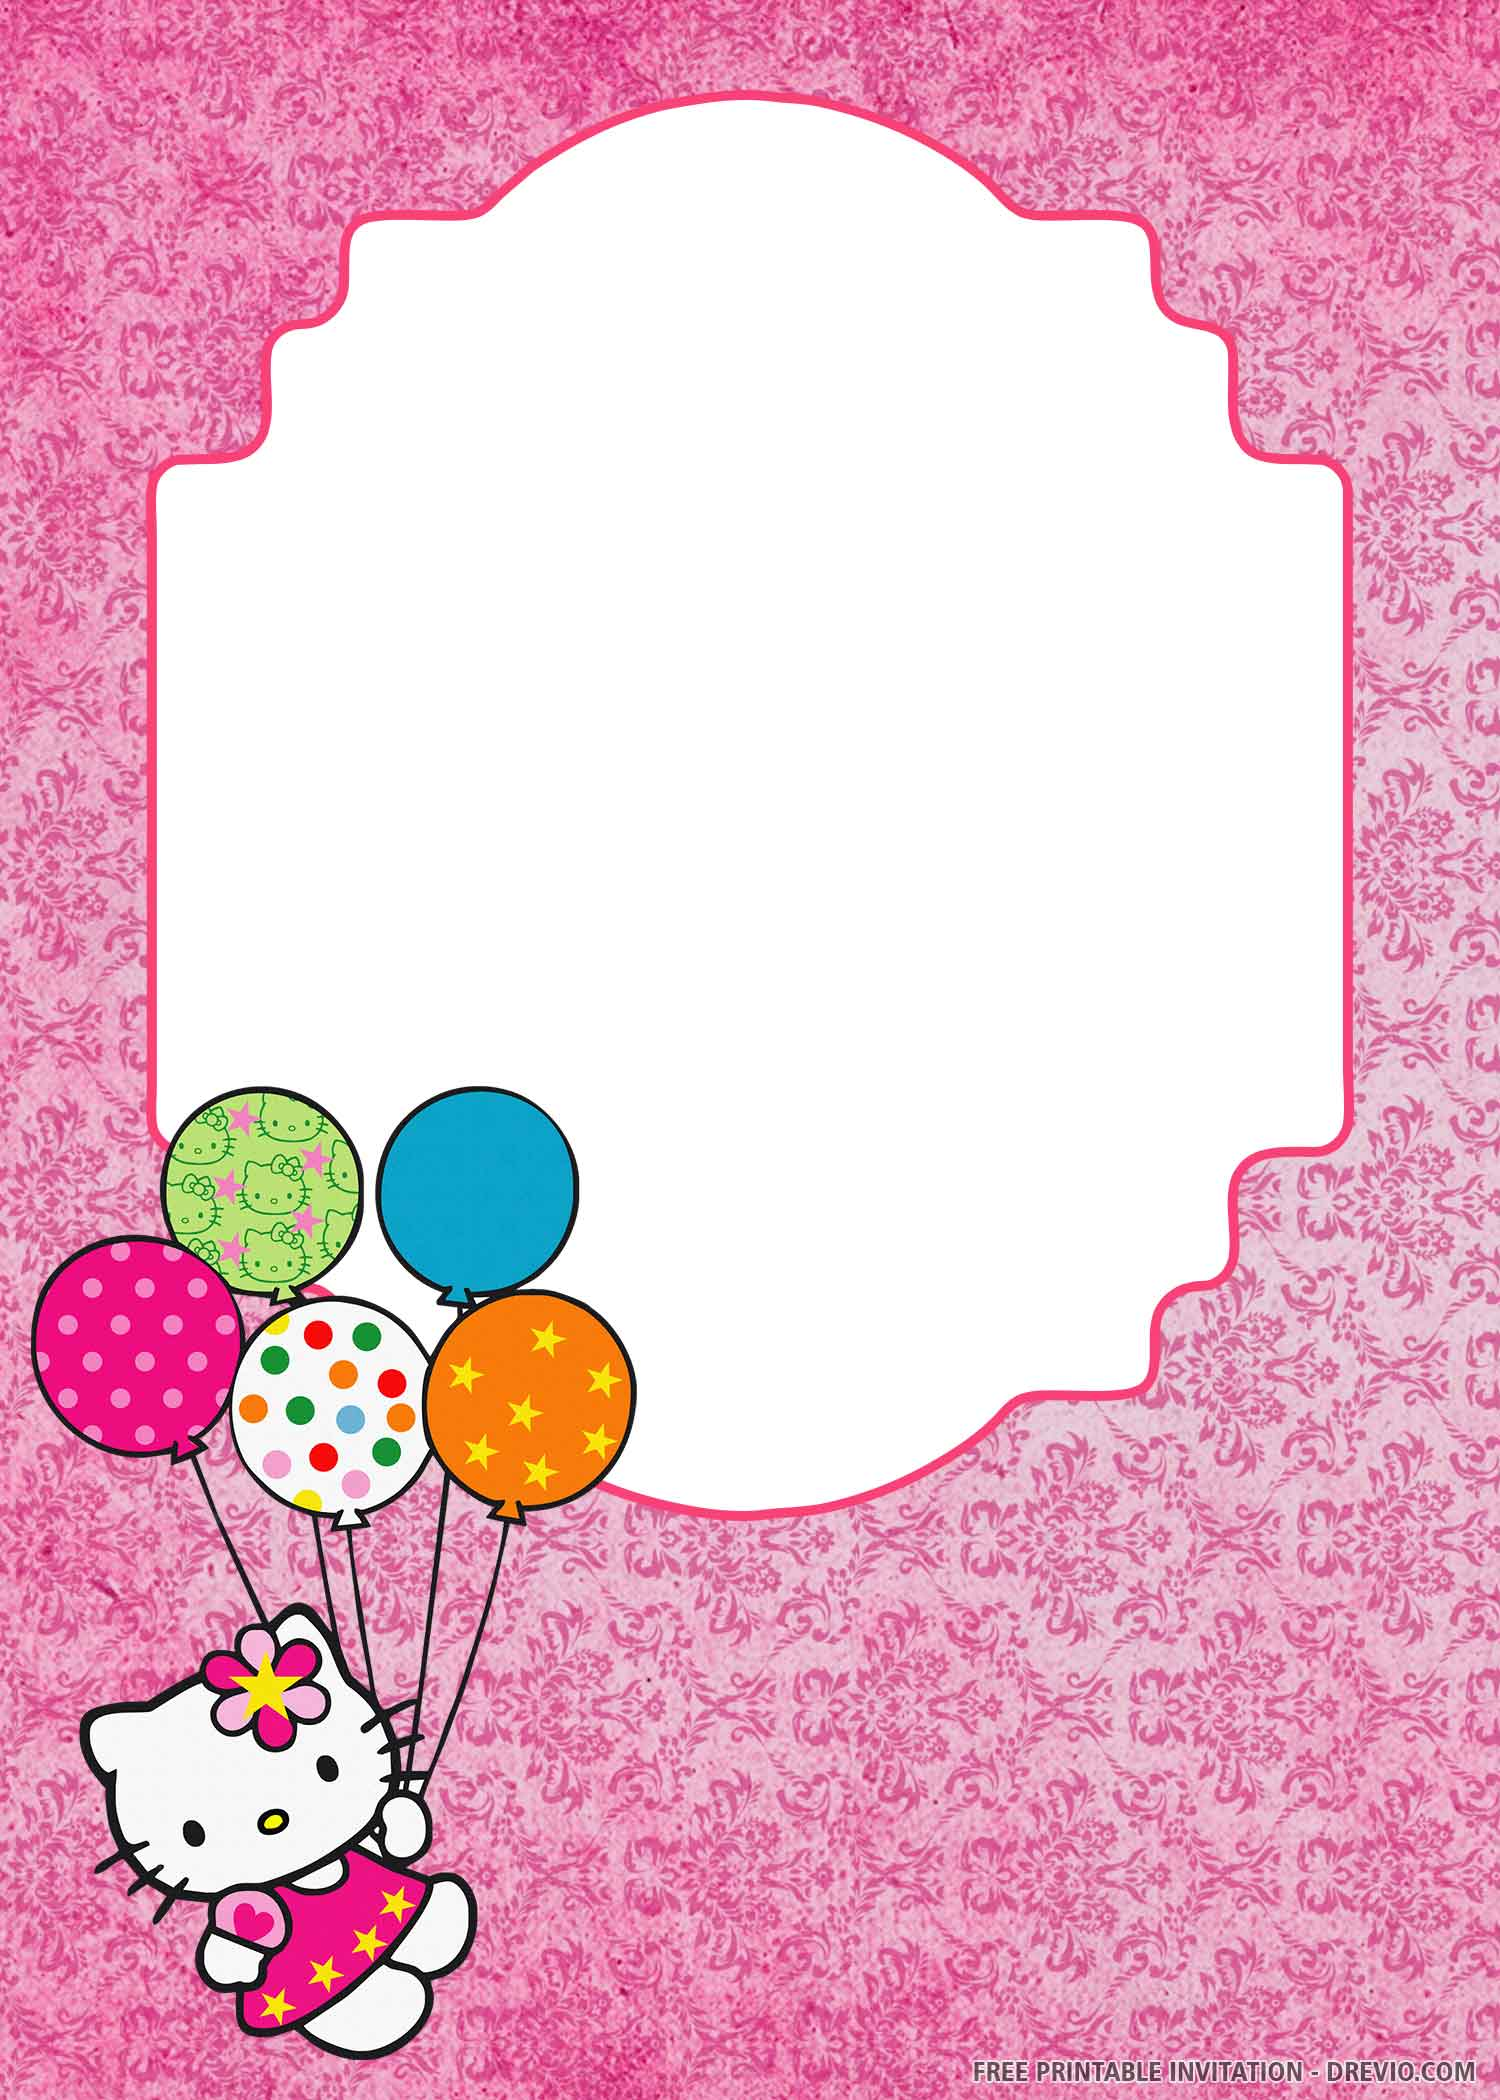 Free Printable Lovely Hello Kitty Birthday Invitation